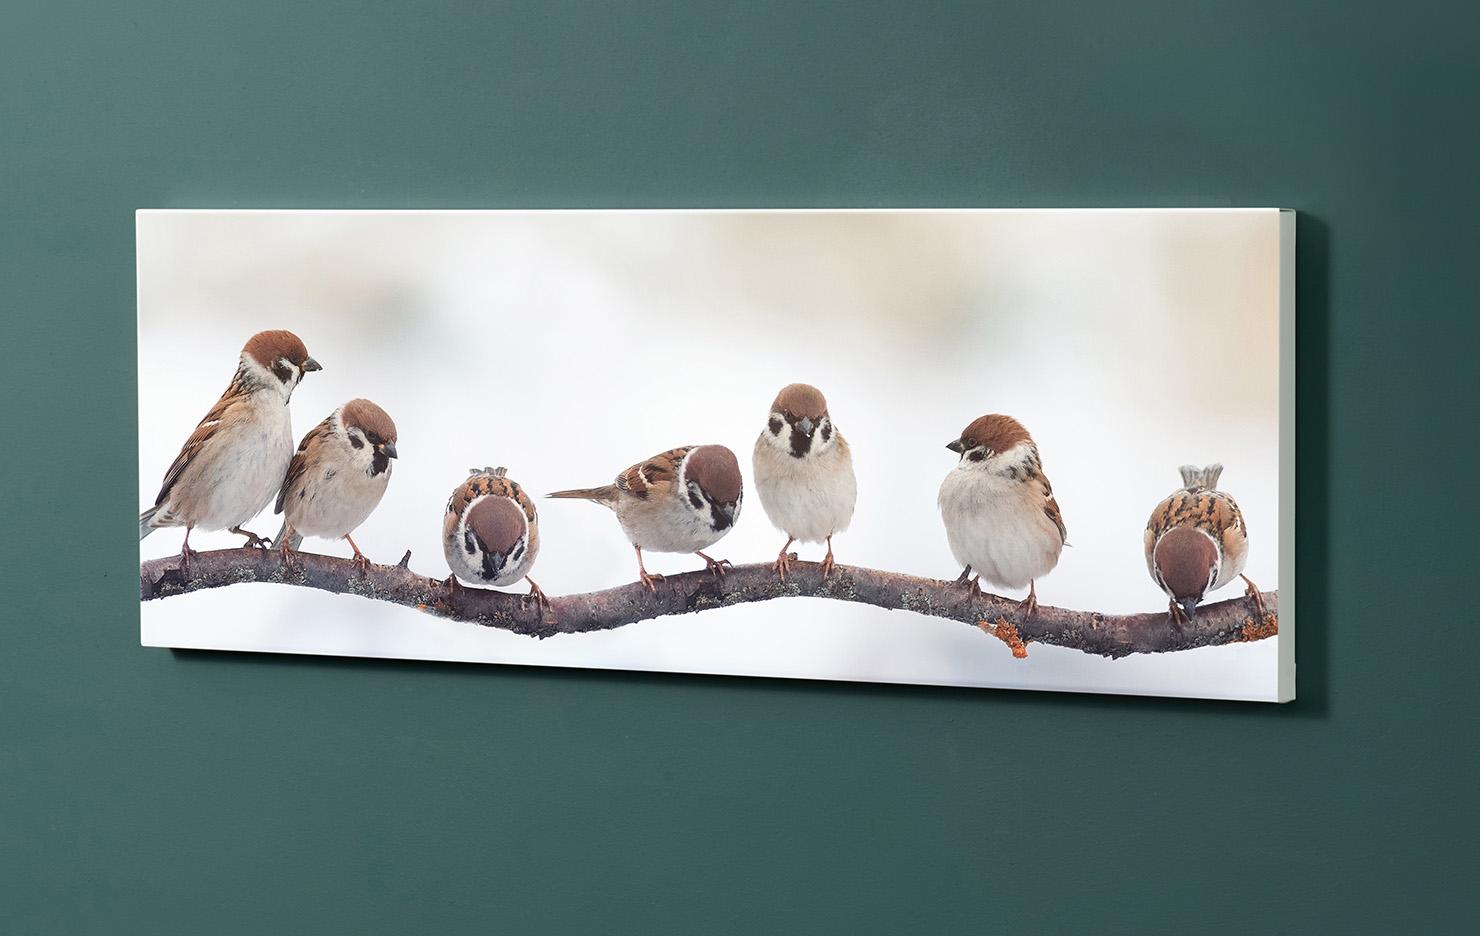 Magnettafel NOTIZ 90x30cm Motiv-Pinnwand M135 Vögel